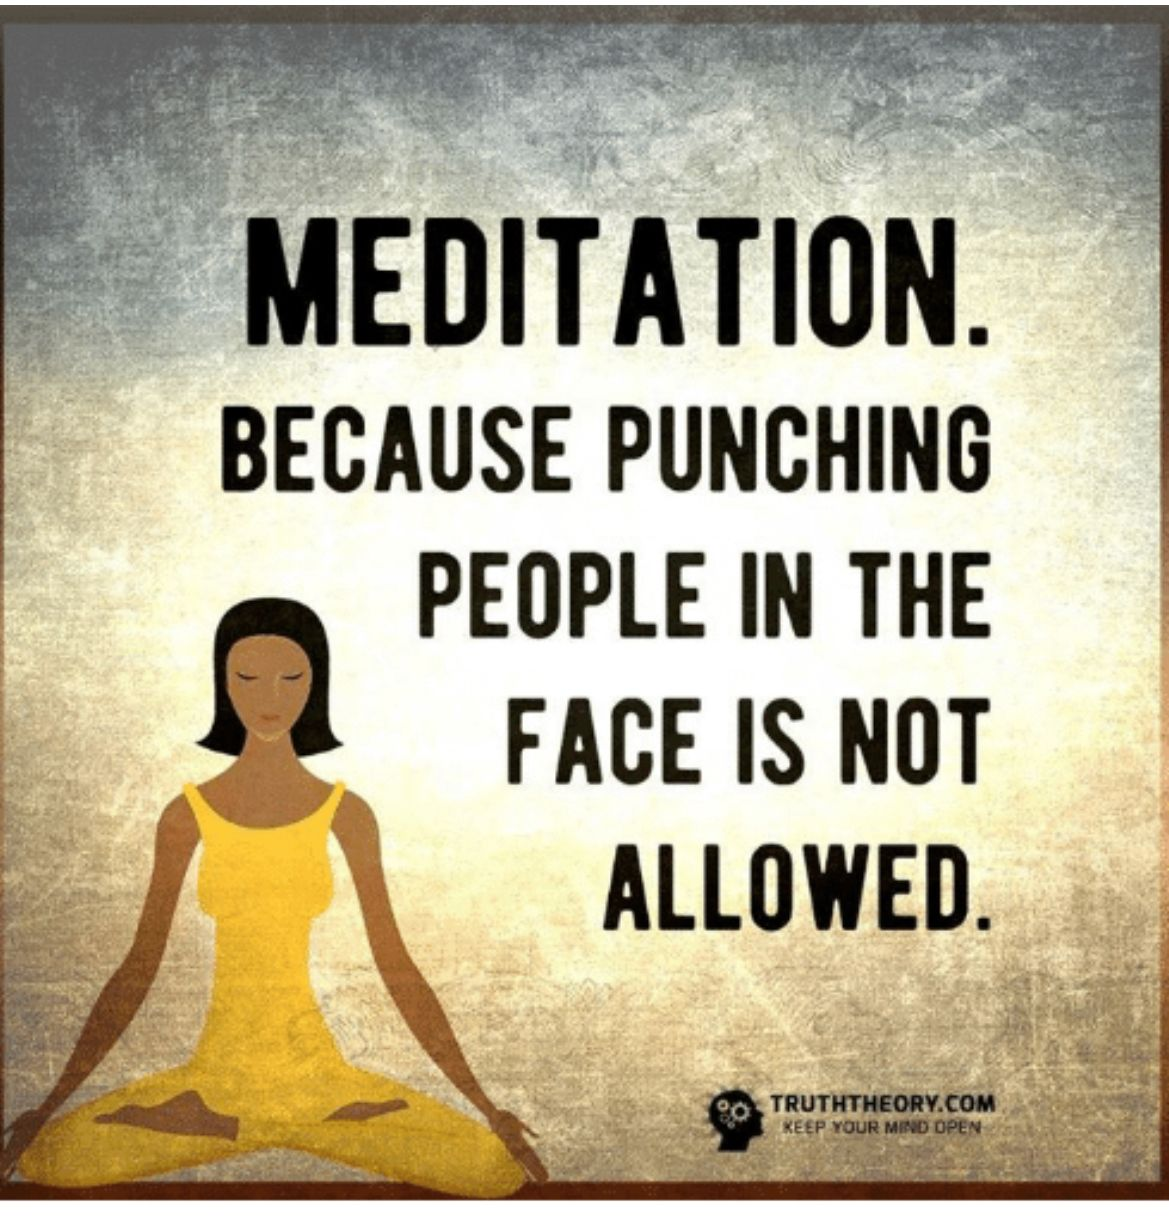 Meditation | Zen quotes, Punching people, Meditation